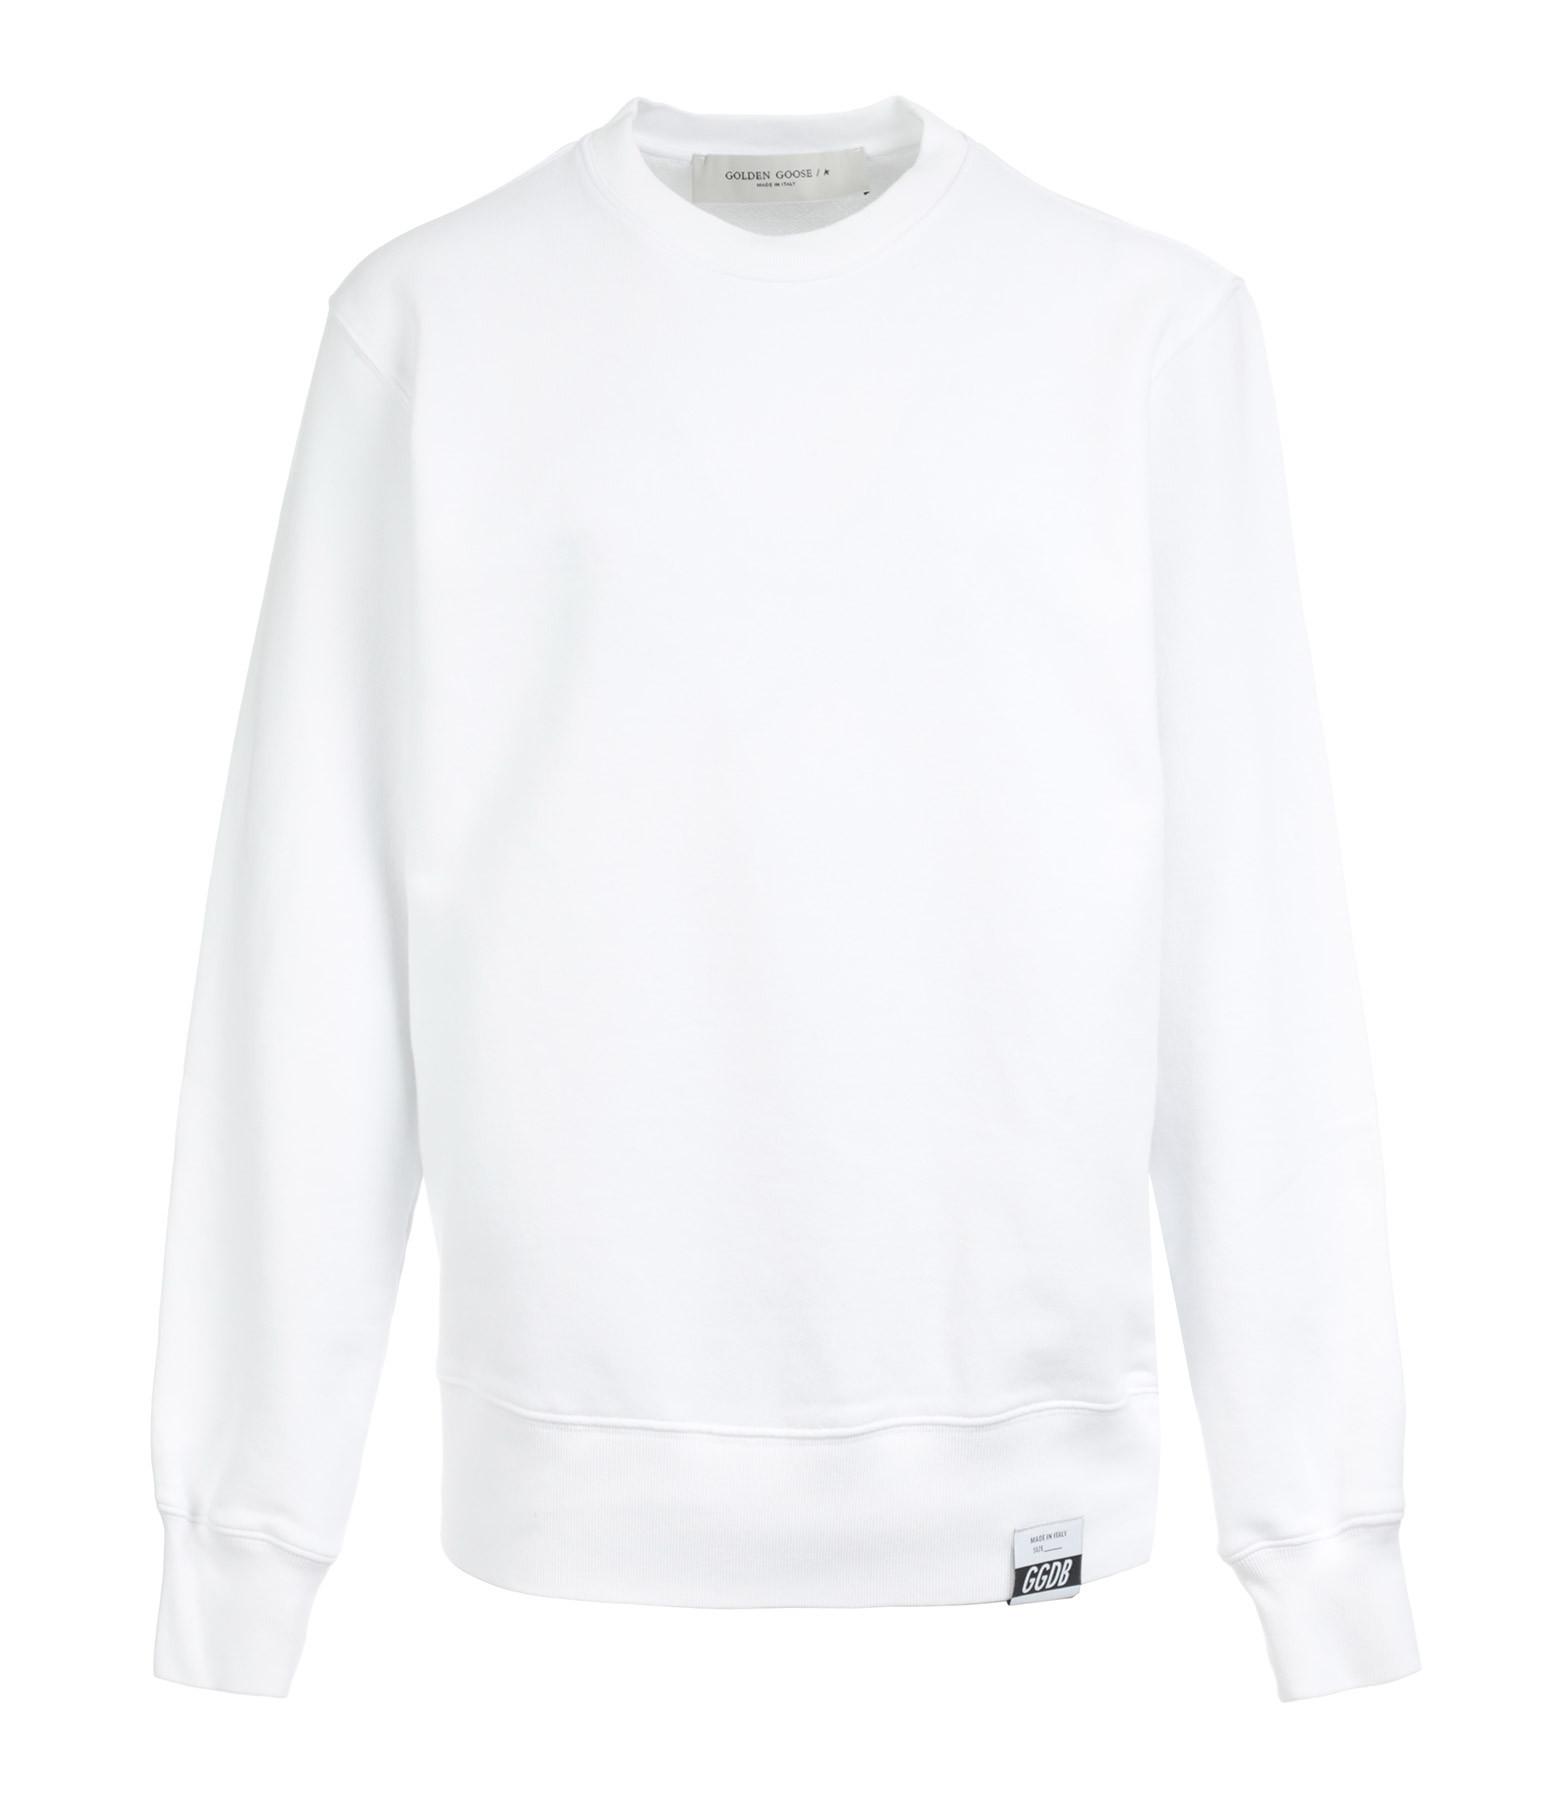 GOLDEN GOOSE - Sweatshirt Homme Archibald Golden Rethink Coton Blanc